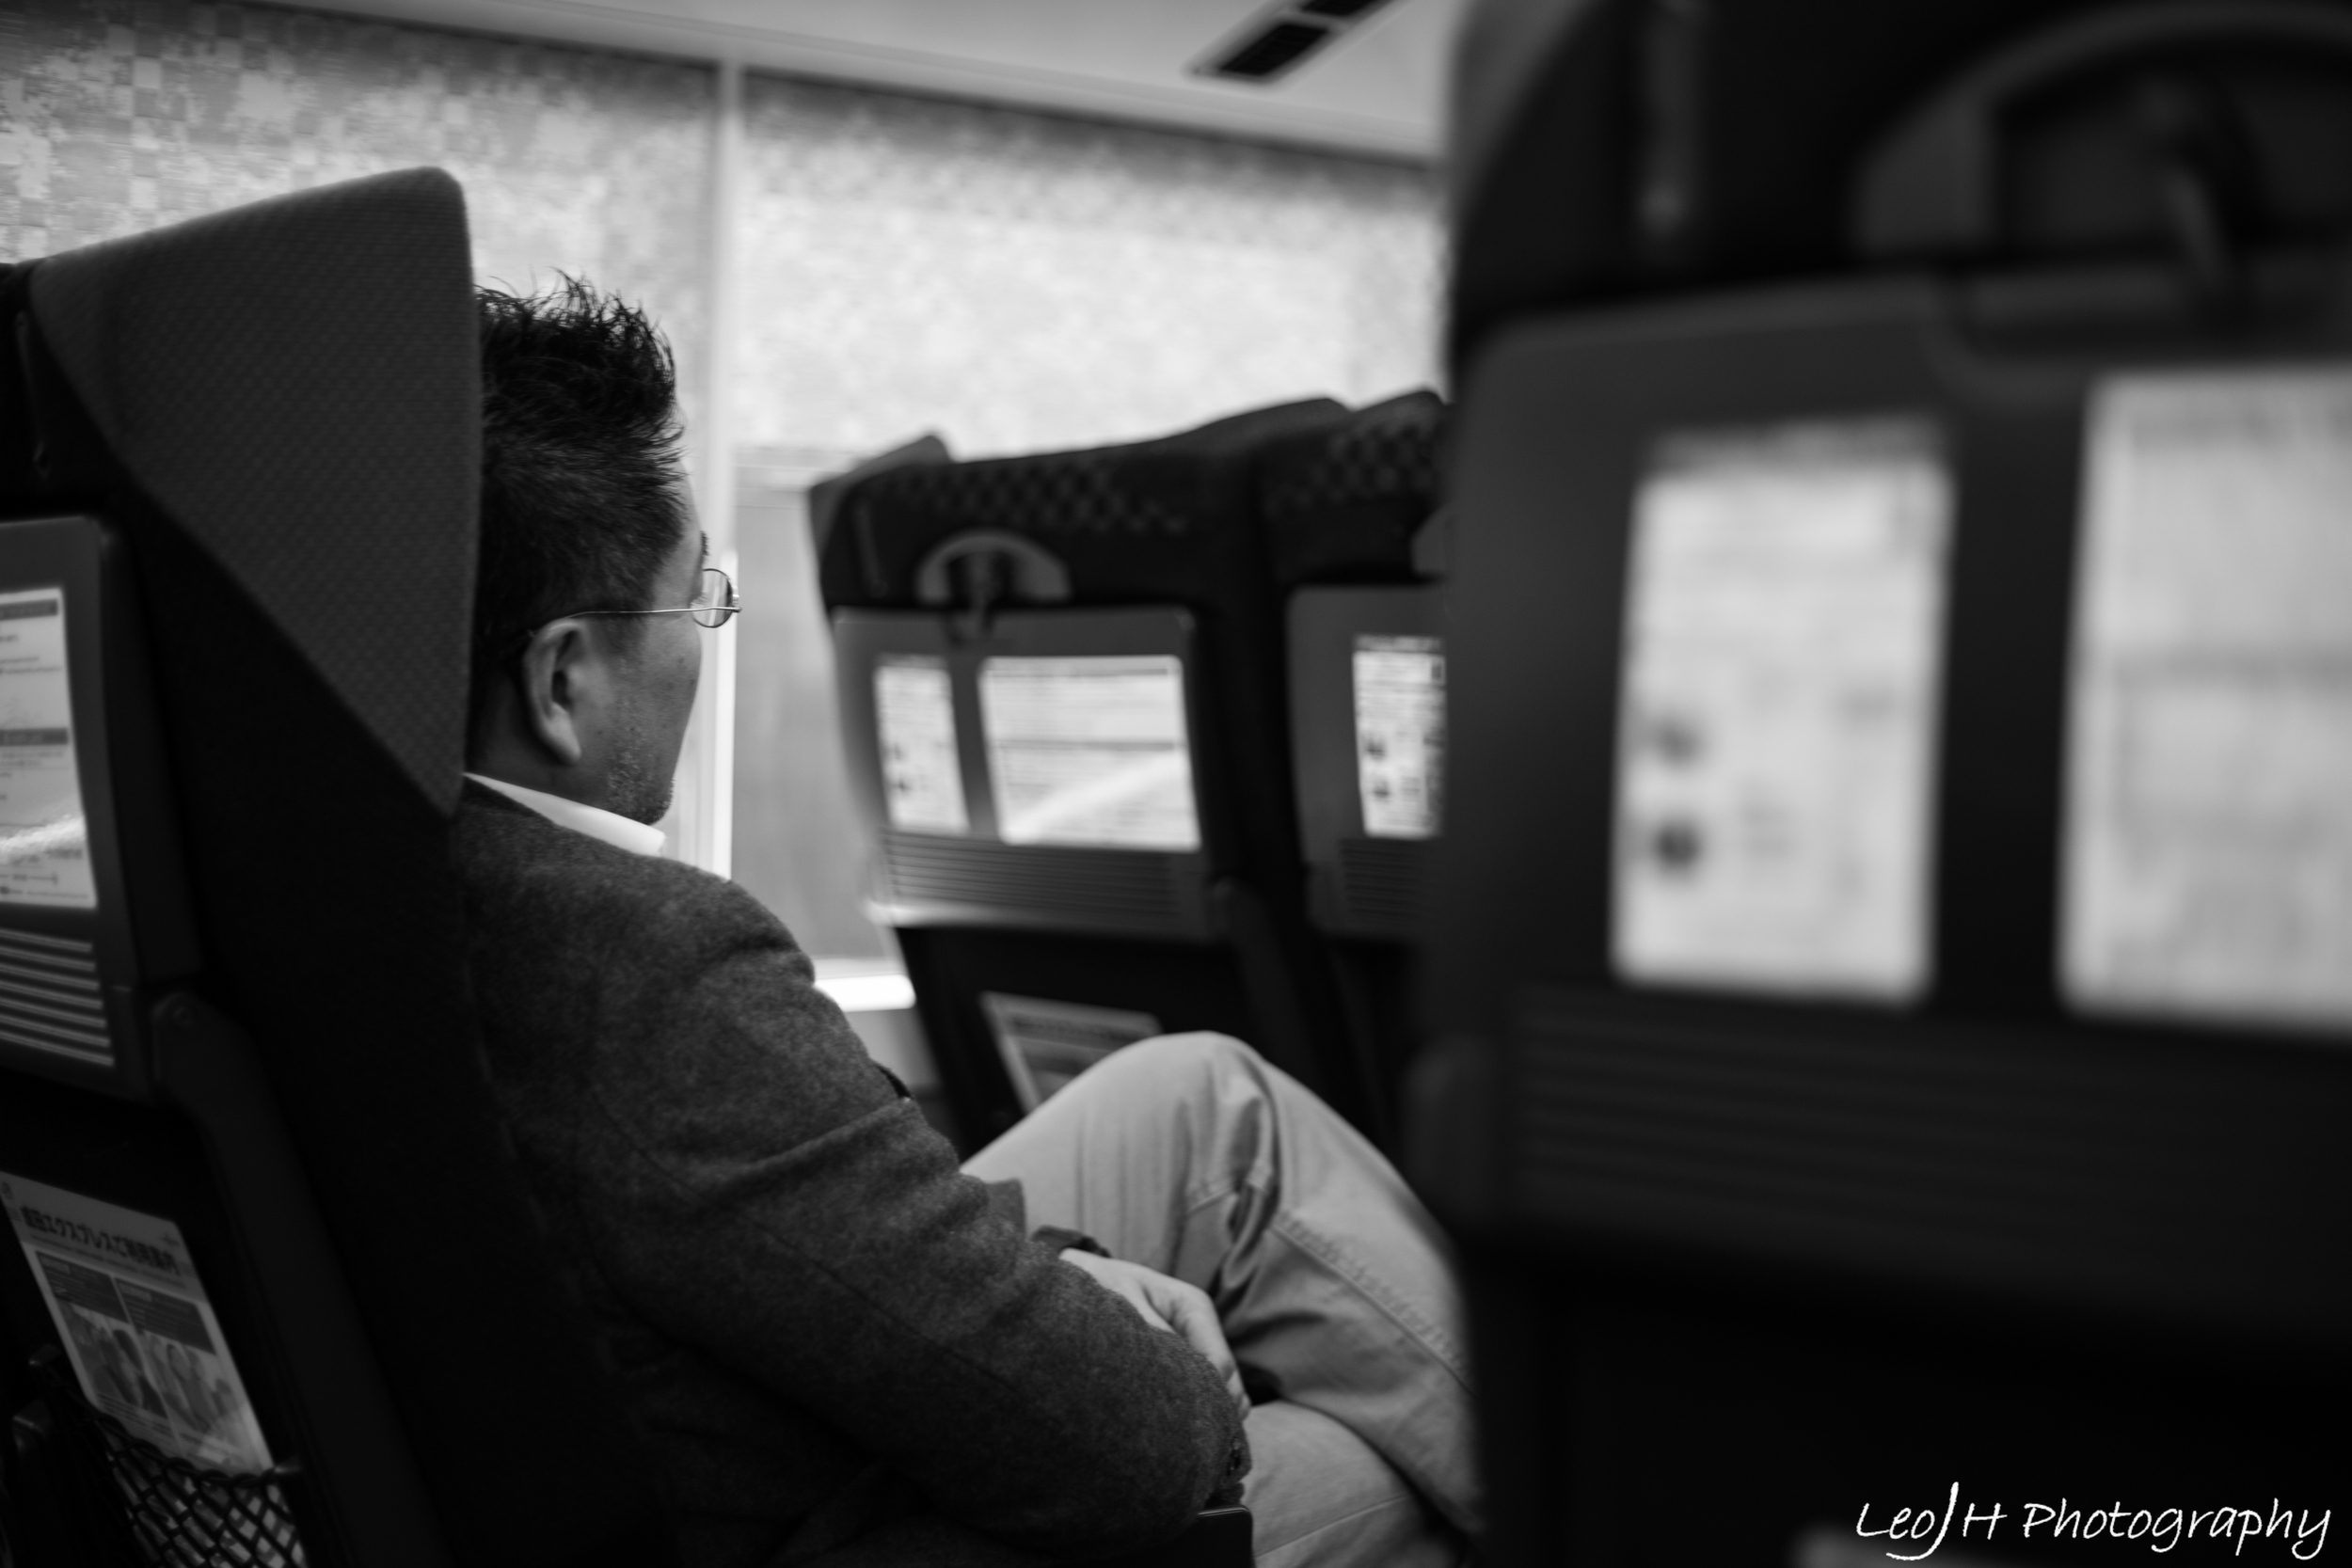 Aboard the Narita Express into Tokyo